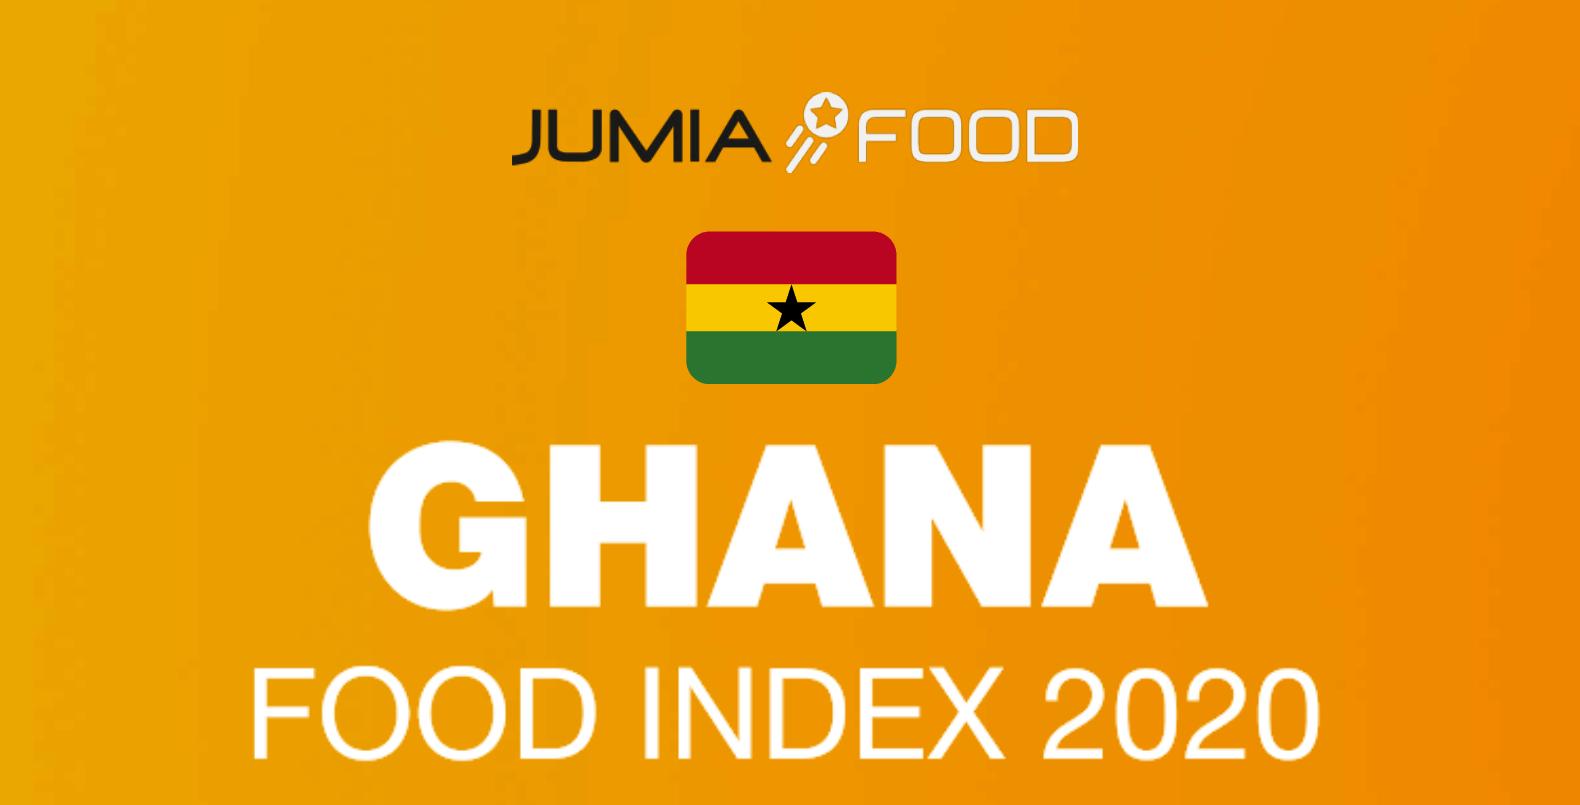 Ghana food index report 2020